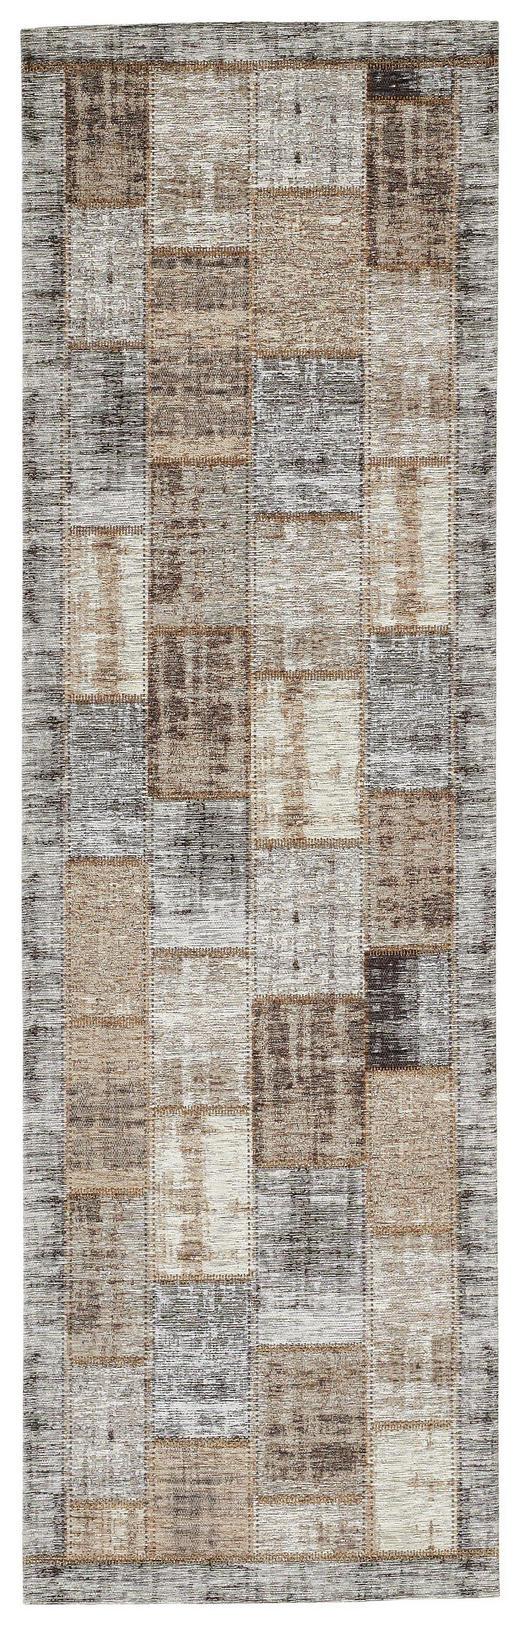 LÄUFER  68/220 cm  Beige, Grau - Beige/Grau, Basics, Textil (68/220cm) - Novel